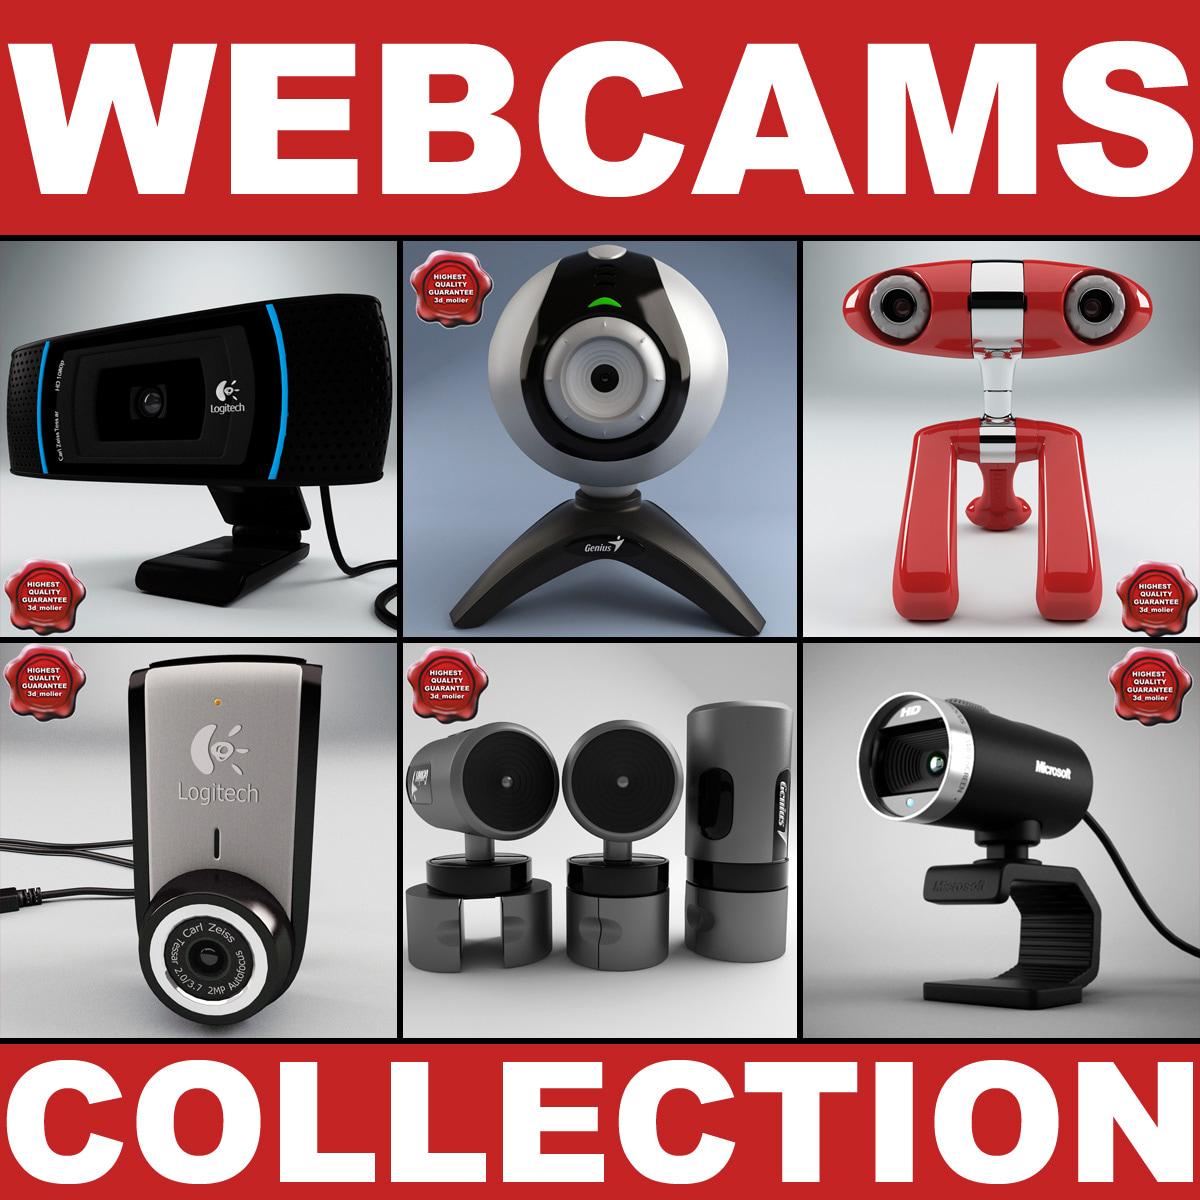 Webcams_Collection_V2_000.jpg